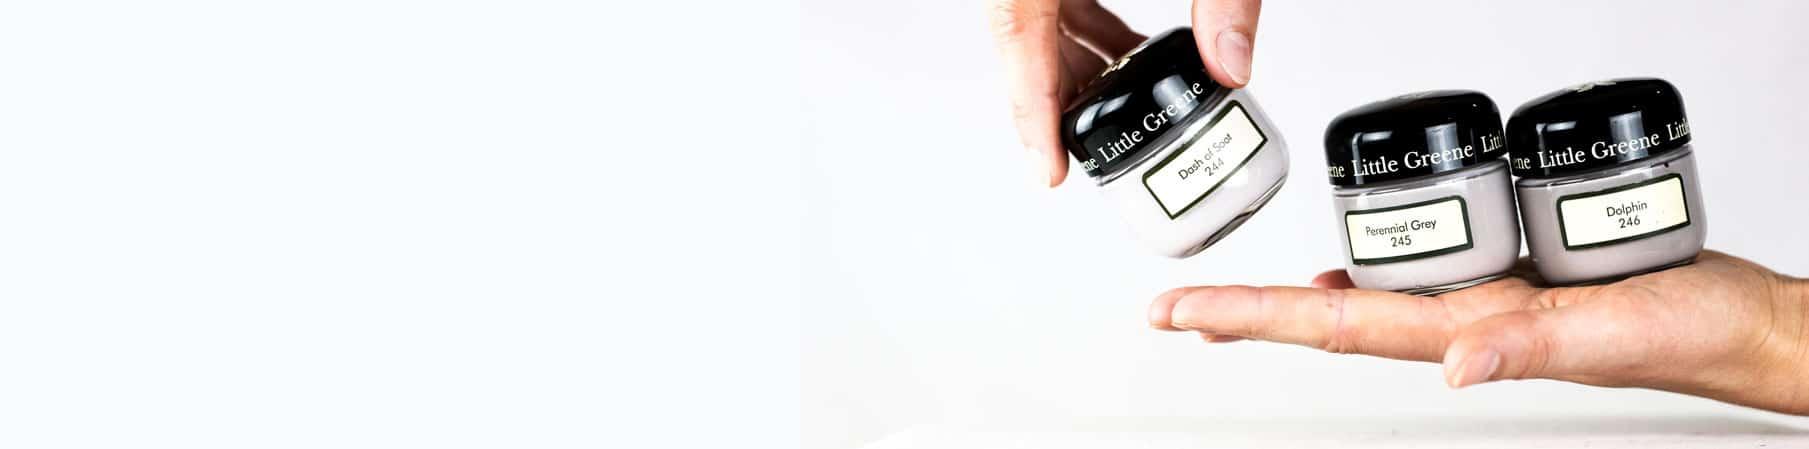 Kategorie warmes grau, Cold Grey, Edle Wandfarbe, Farbe testen, Graue Wandfarbe, Kalte Wandfarbe, Kühles Grau, Little Greene, Probedöschen, Sample Pot, Wandfarbe Eingangsbereich, Wandfarbe Flur, Wandfarbe hellgrau, Wandfarbe Schlafzimmer, Wandfarbe Wohnzimmer